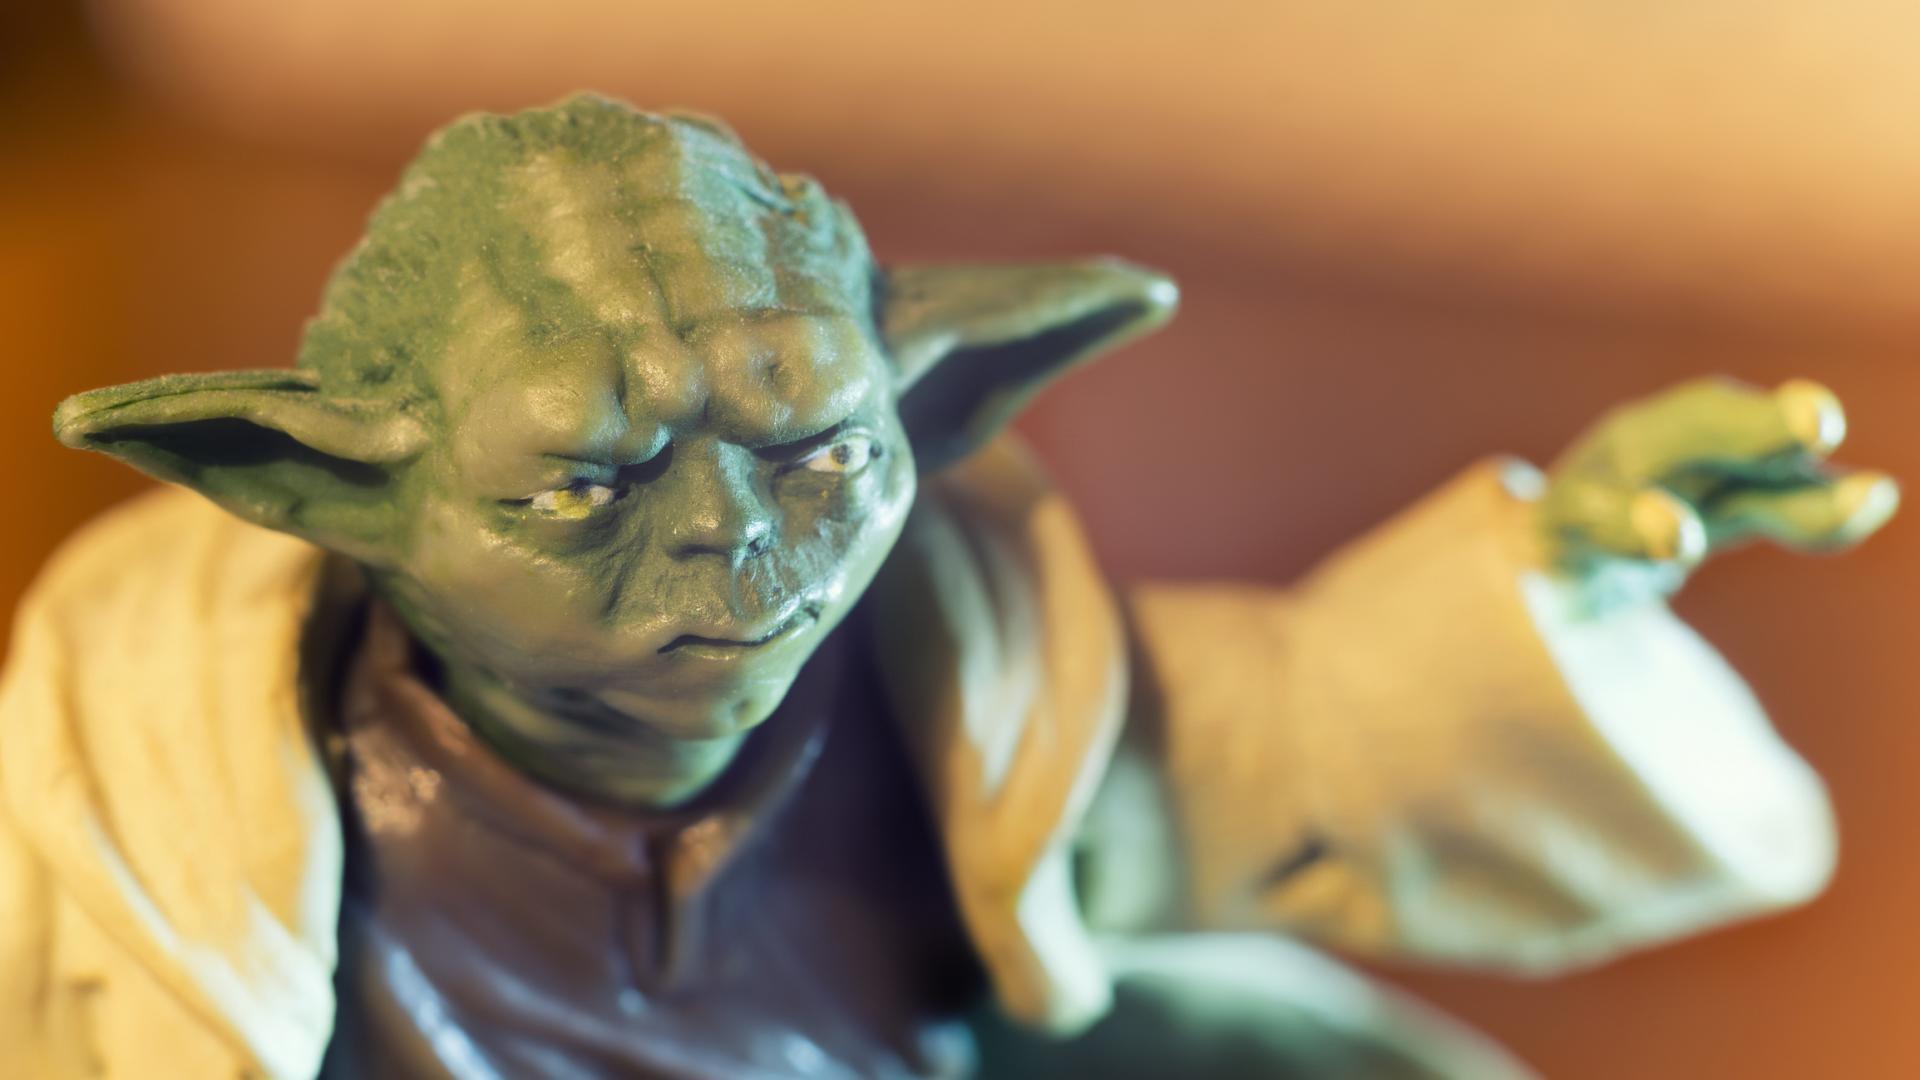 toy Yoda figure